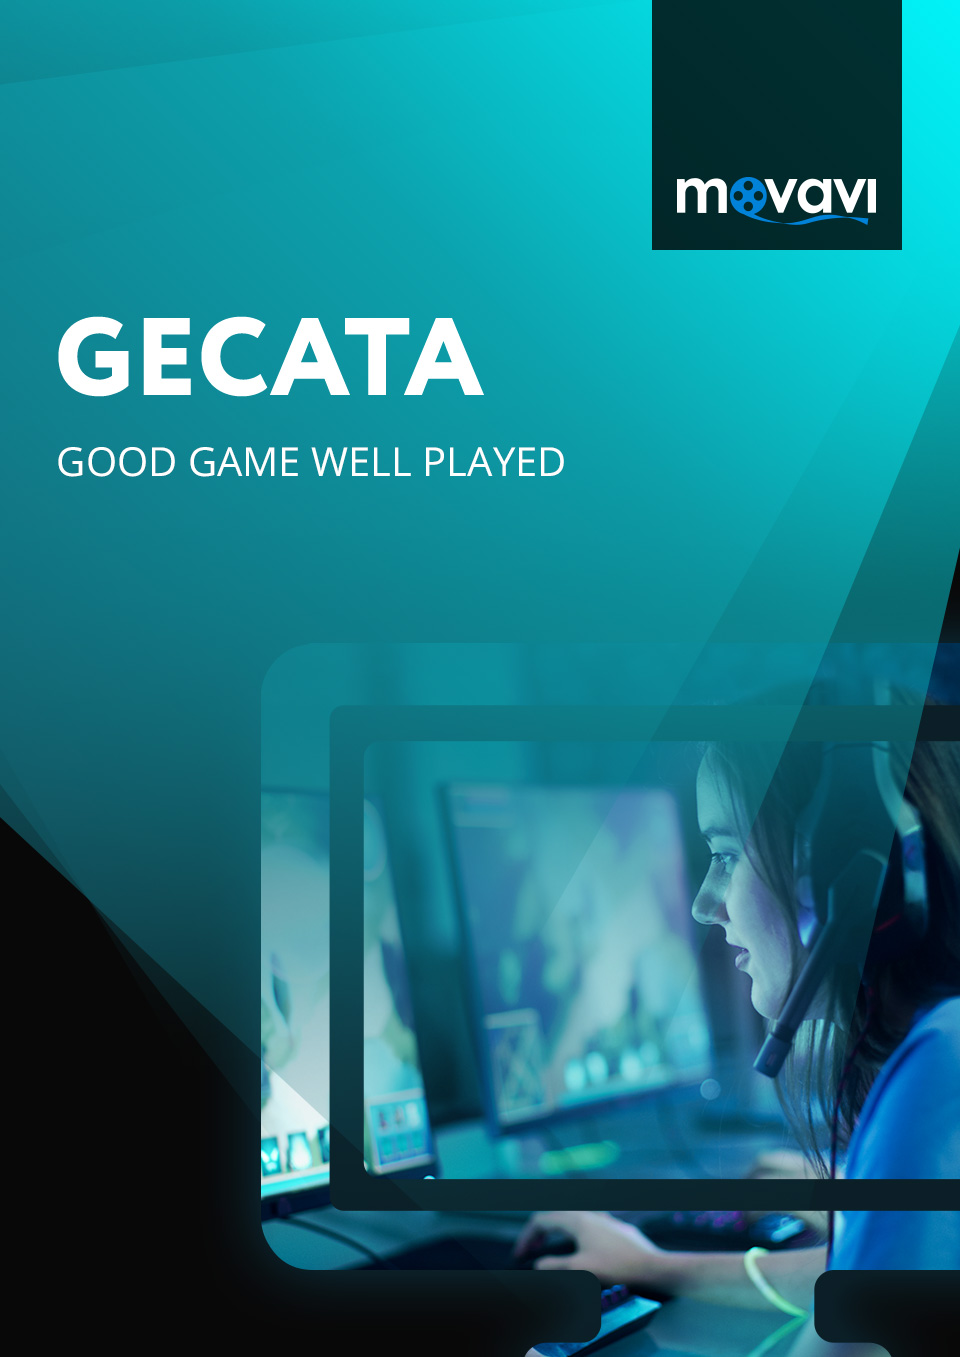 Gecata by Movavi [Download] by Movavi